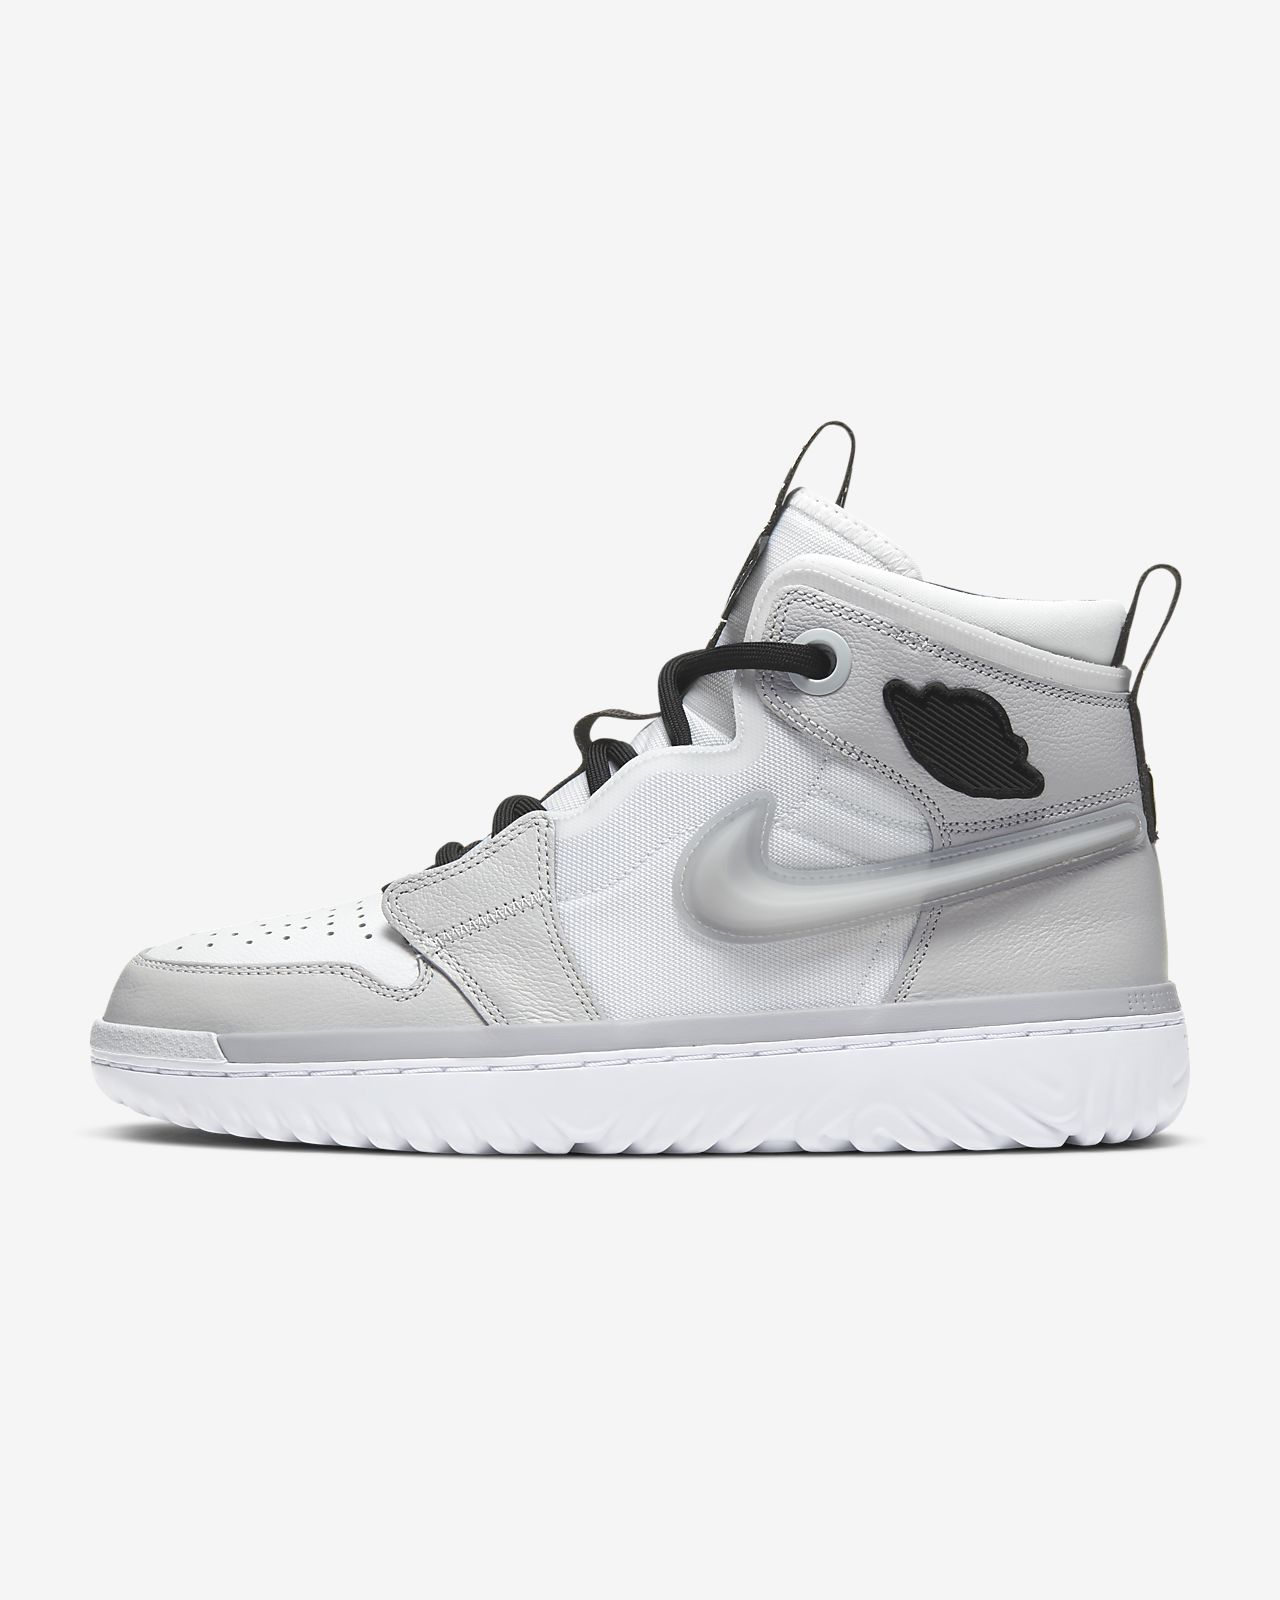 Komfort Nike Turnschuhe | Nike Air Max Ld Zero Textile